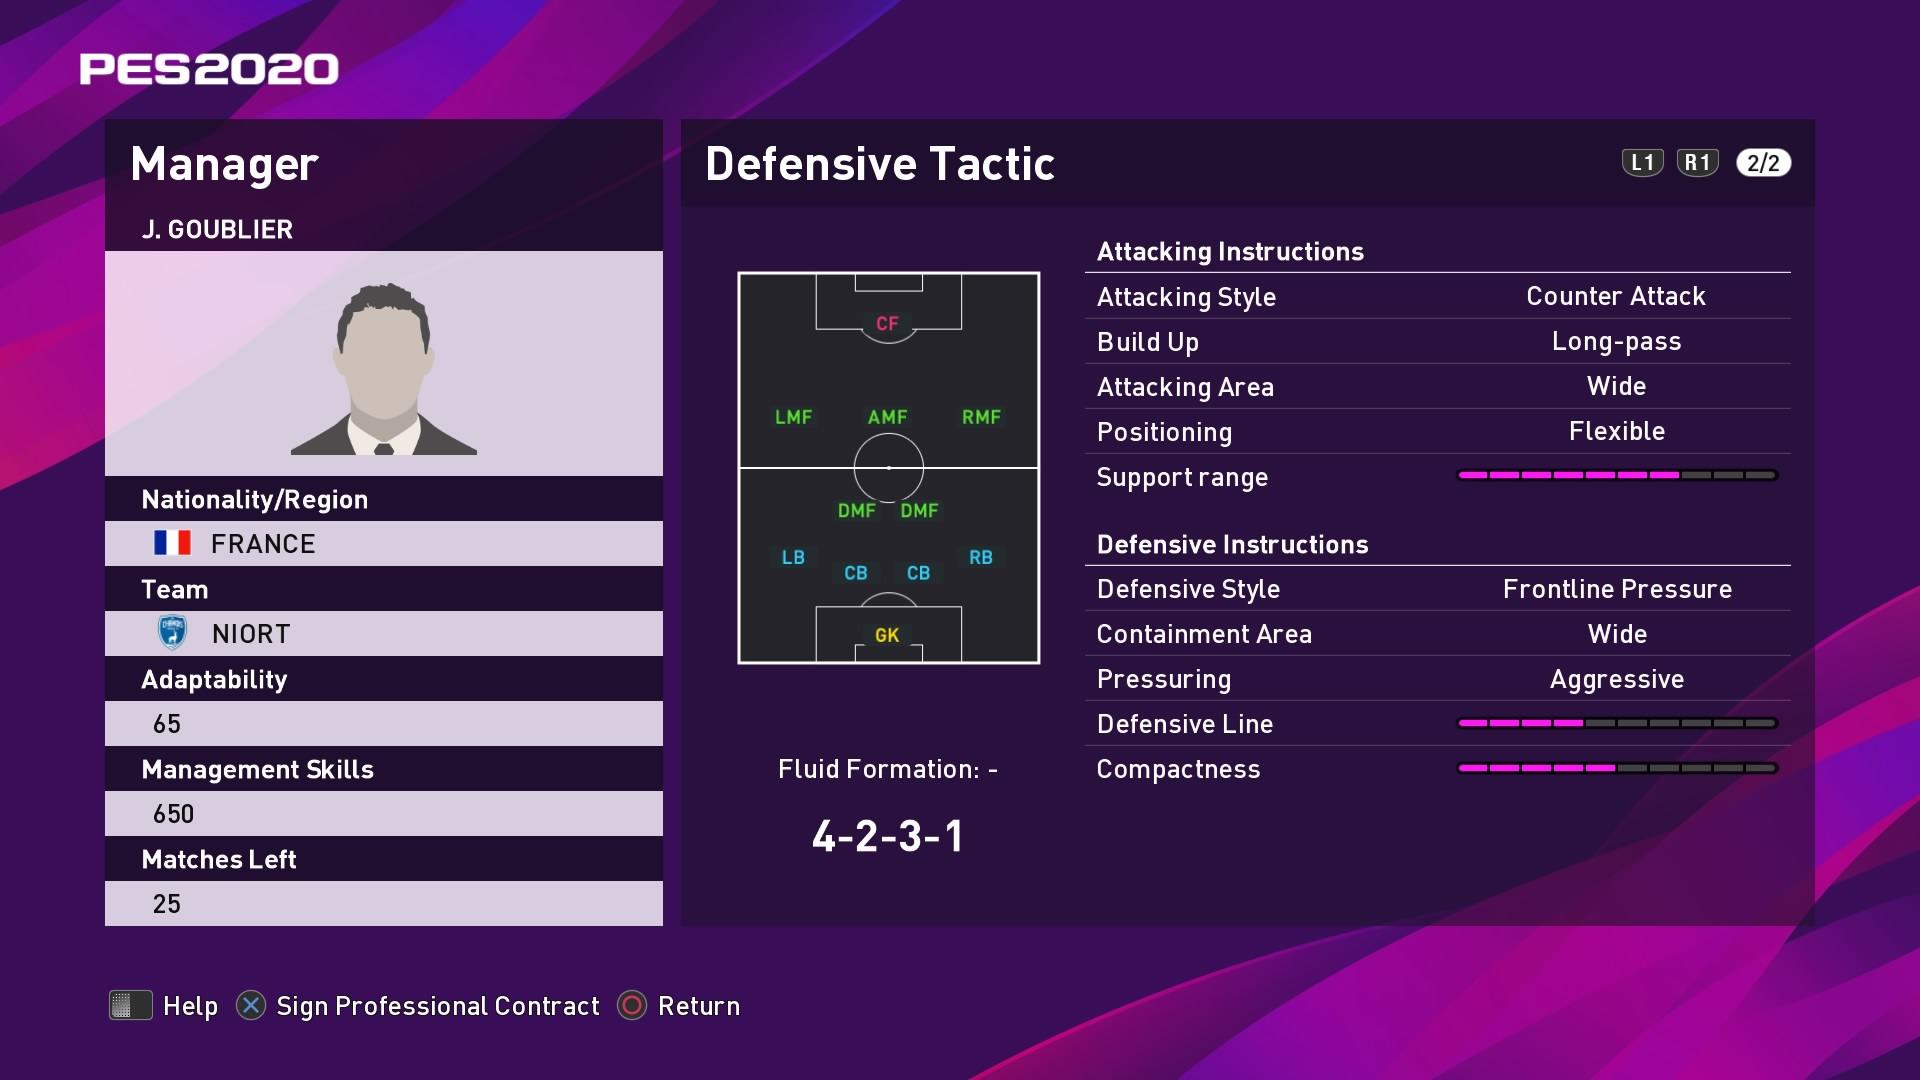 J. Goublier (Franck Passi) Defensive Tactic in PES 2020 myClub